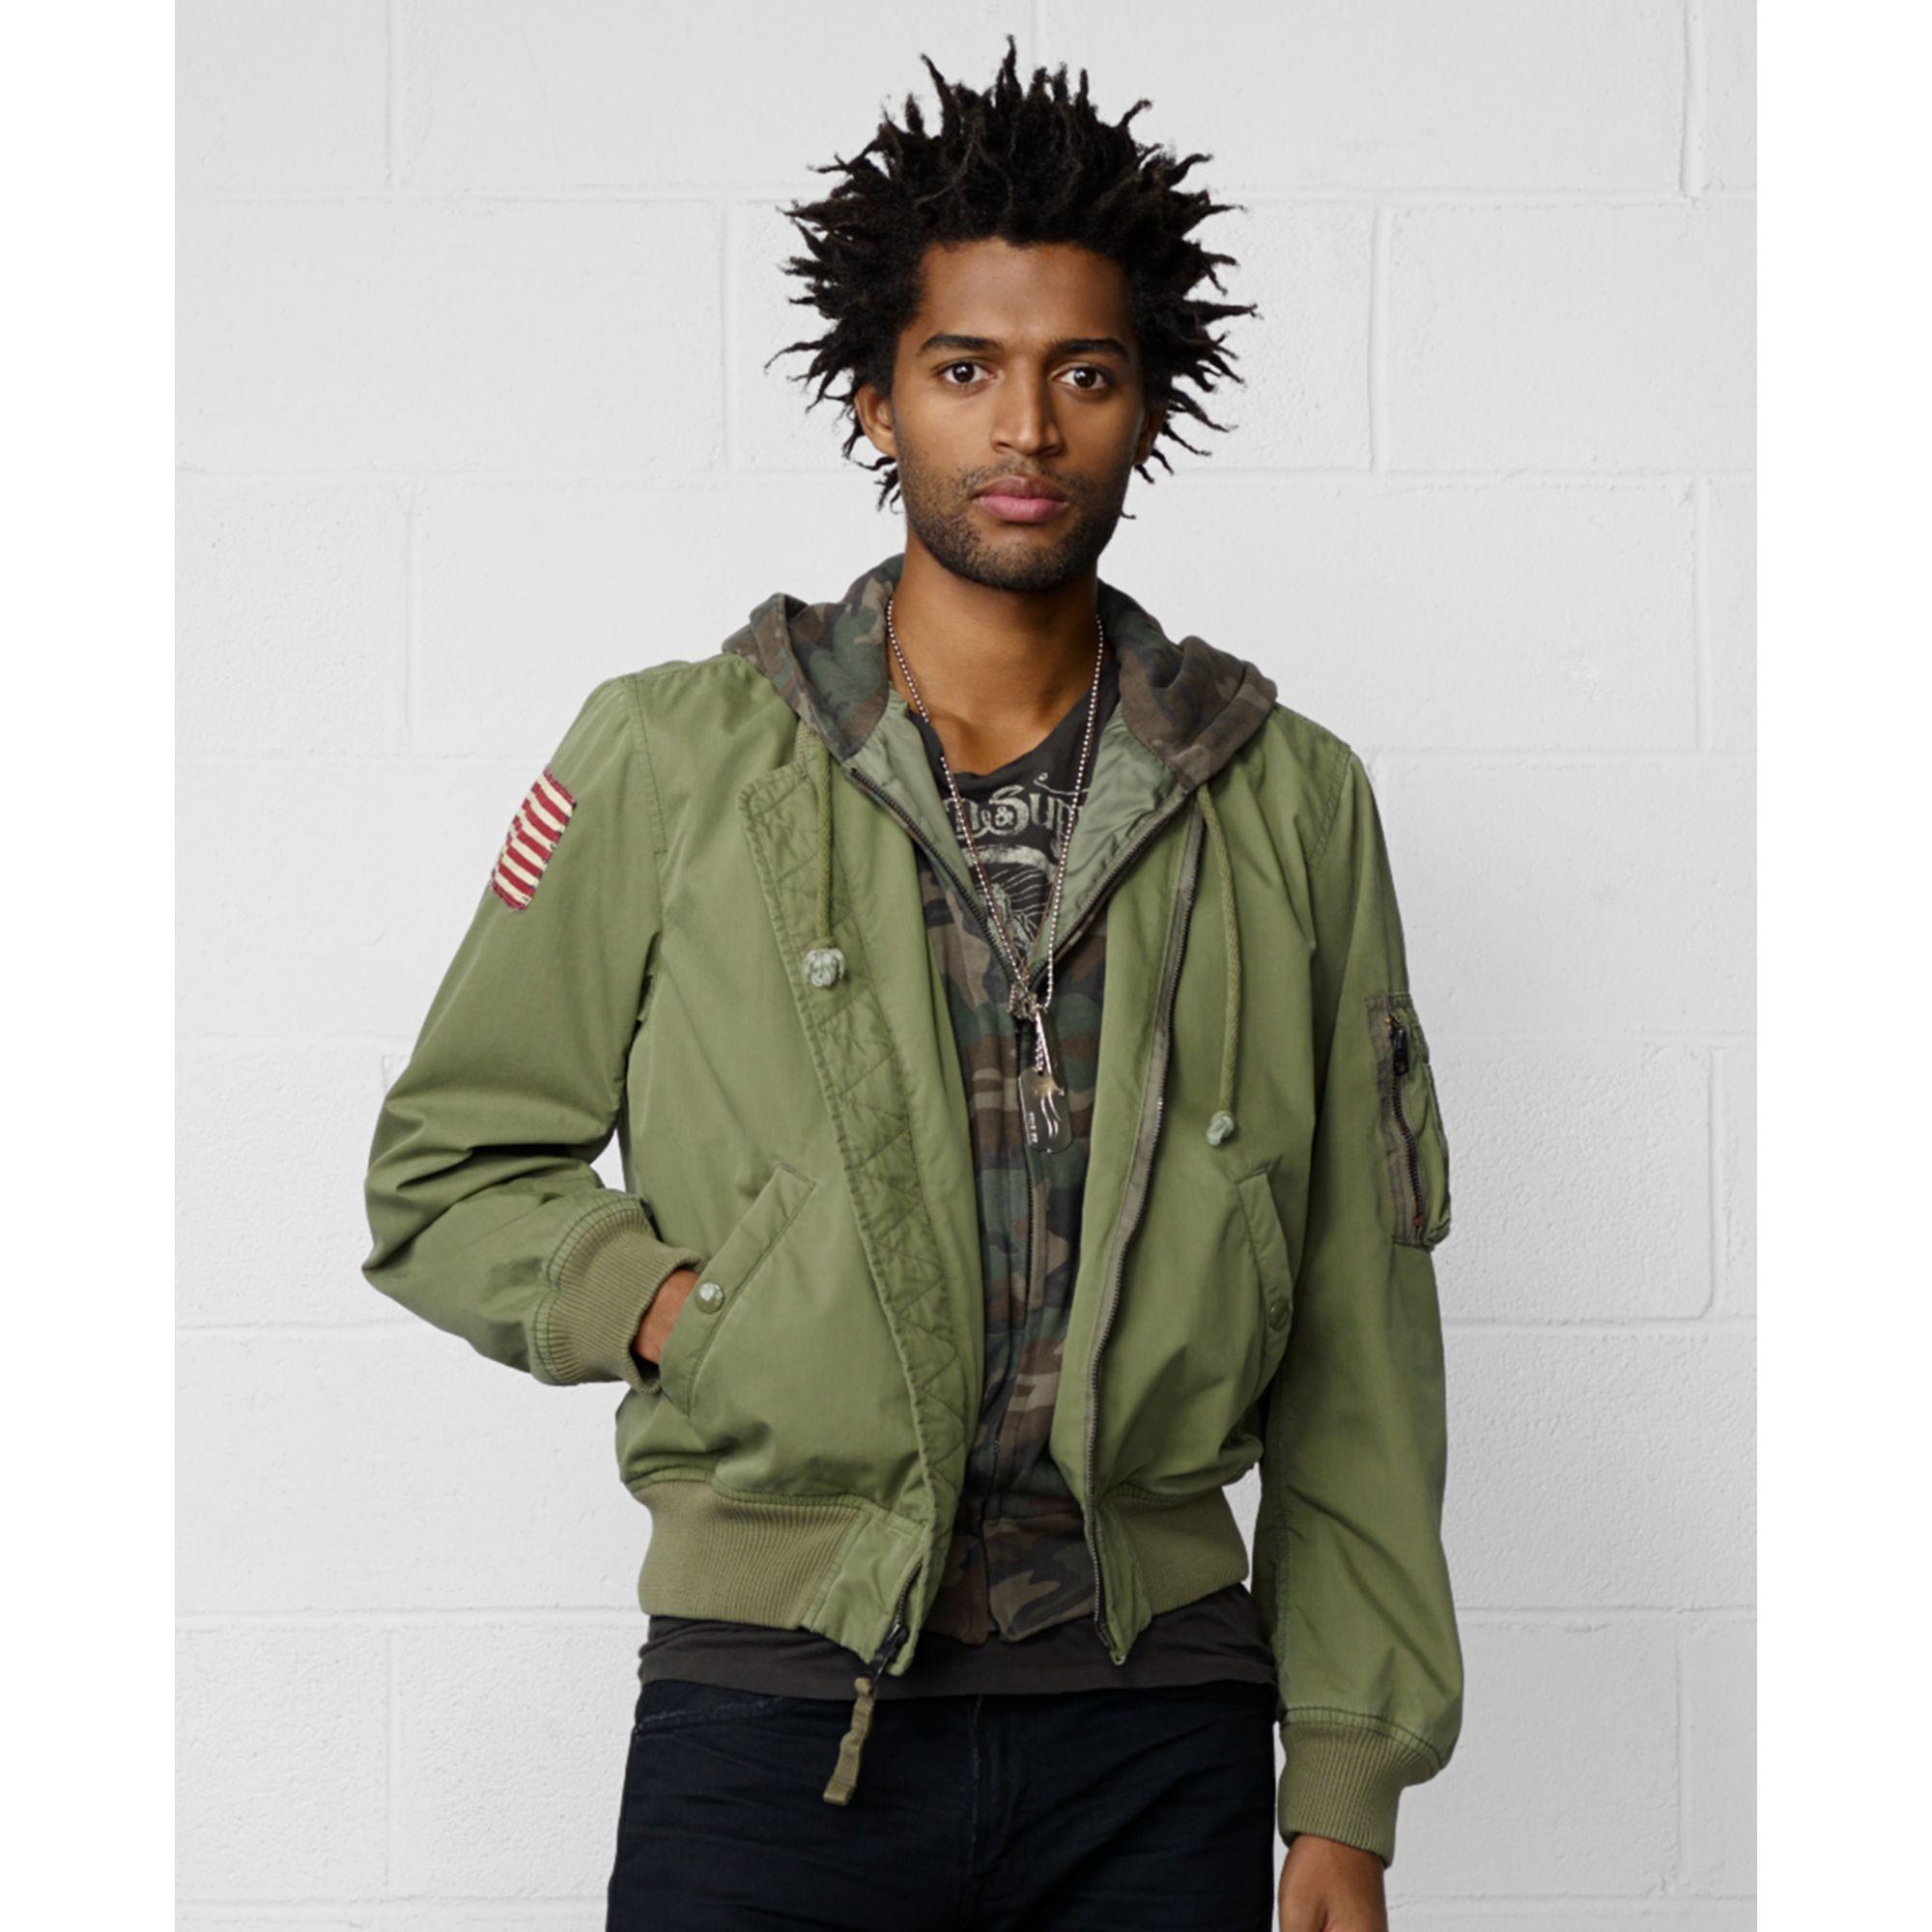 denim supply ralph lauren hooded bomber jacket in green. Black Bedroom Furniture Sets. Home Design Ideas